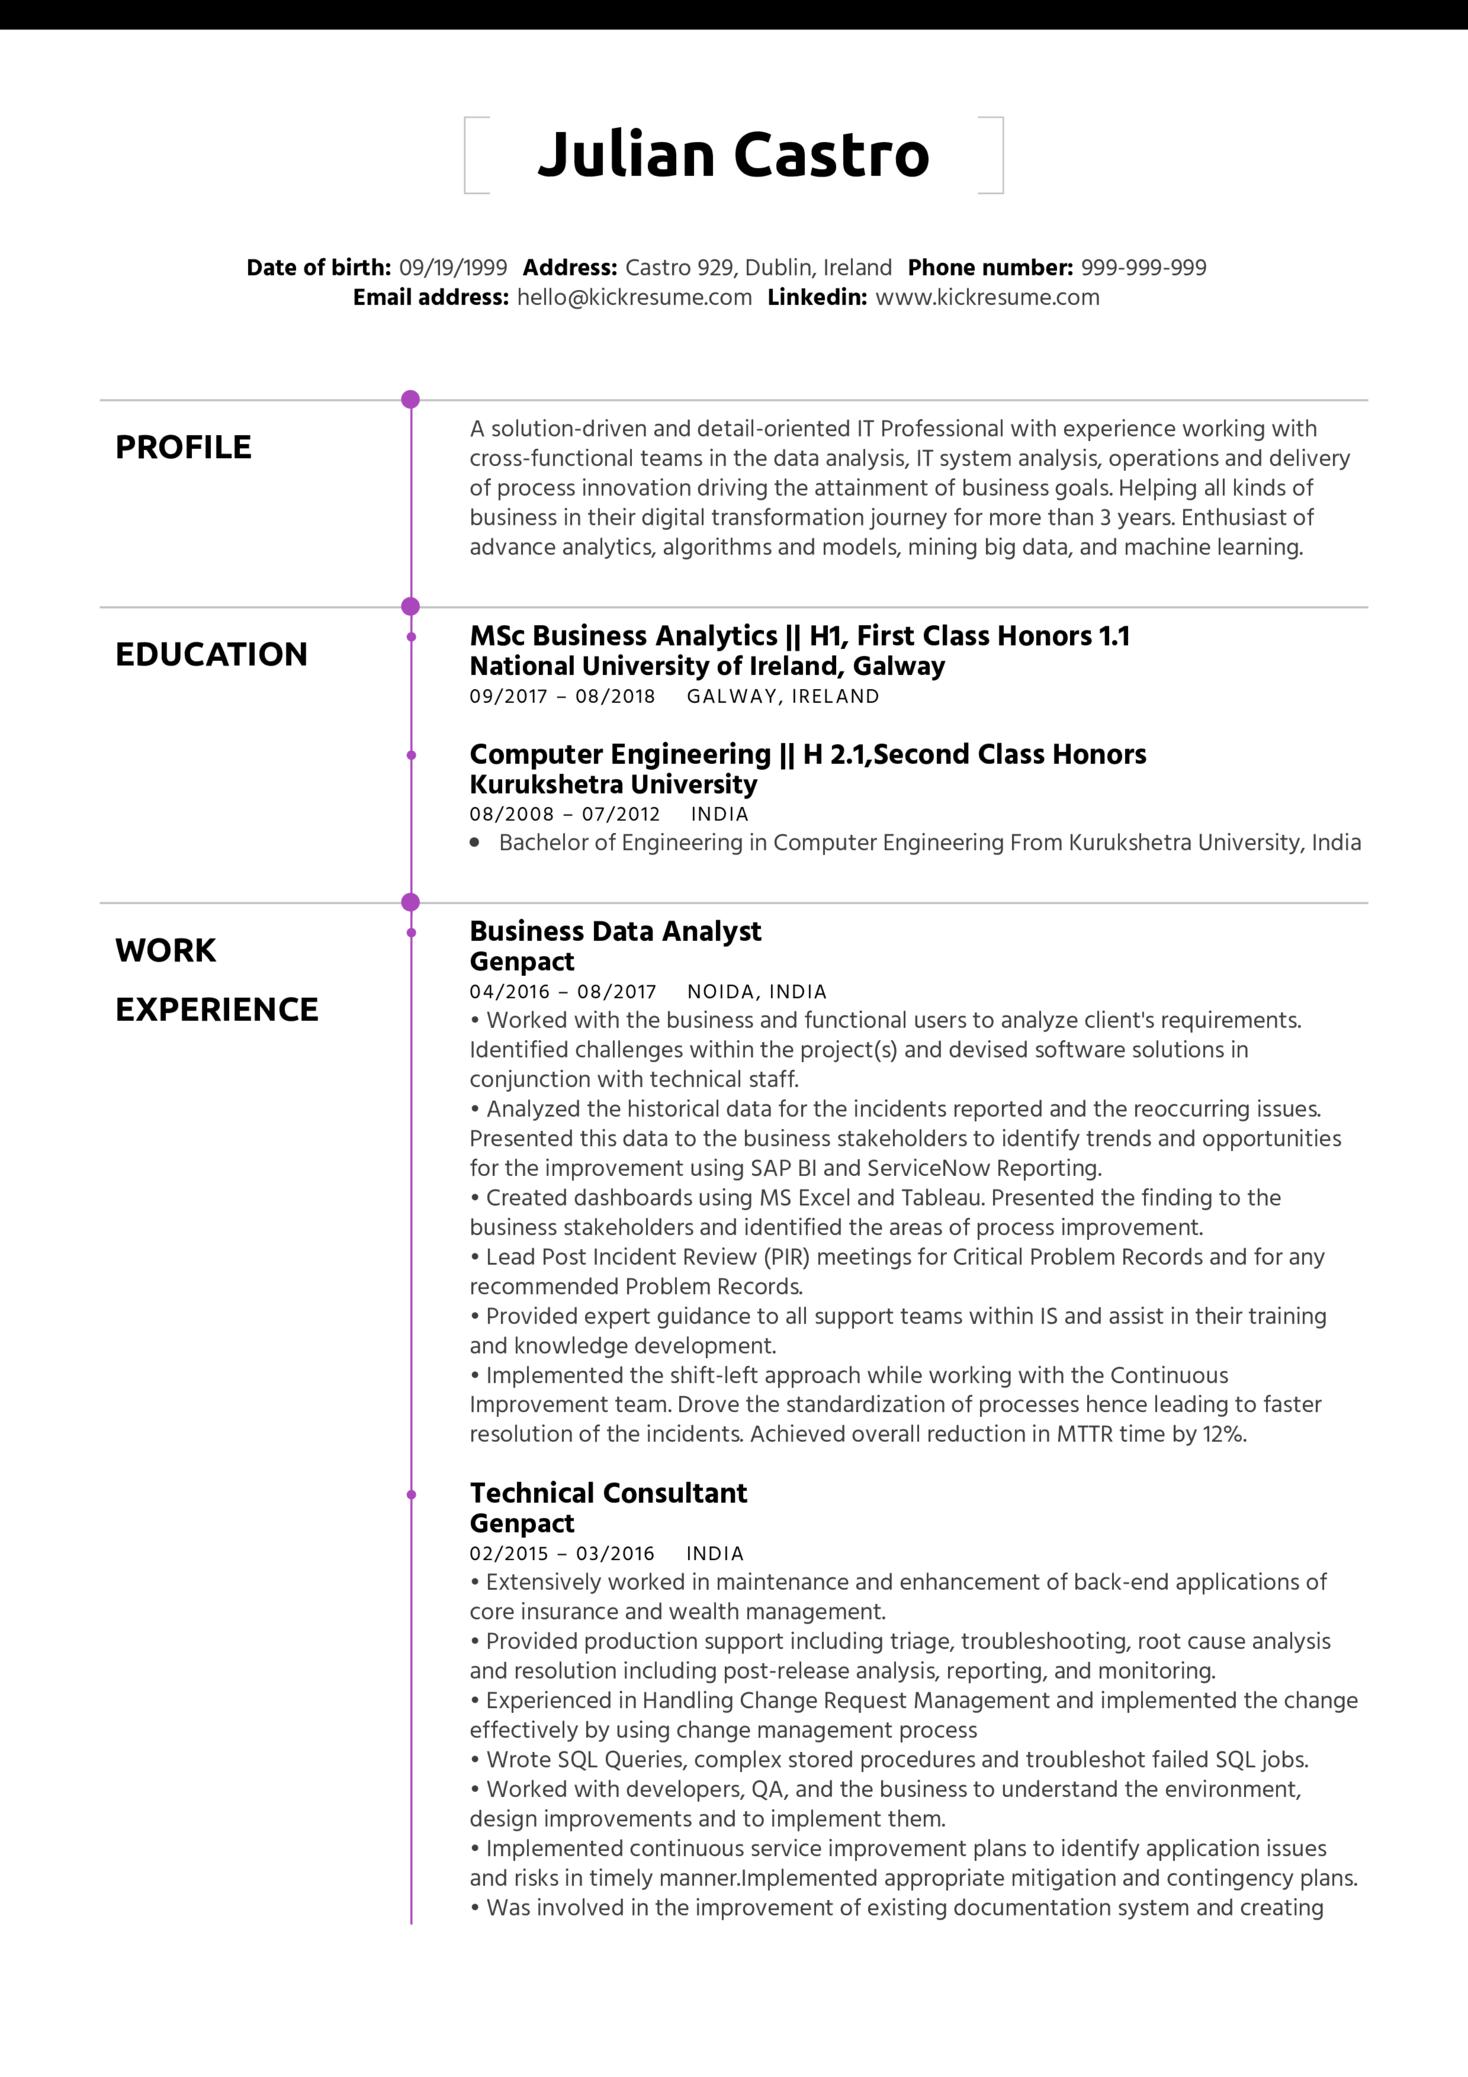 Business Process Analyst CV Sample (Teil 1)